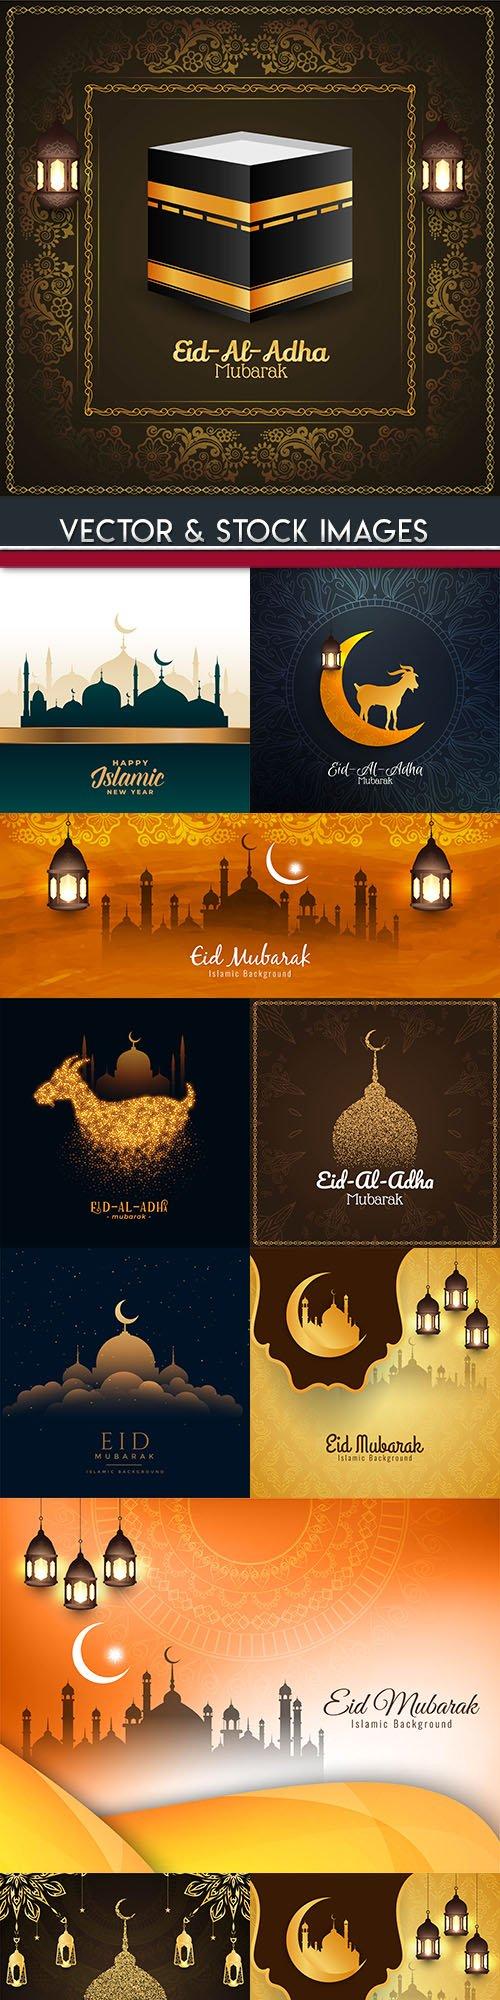 Ramadan Kareem Islamic culture collection illustrations 15